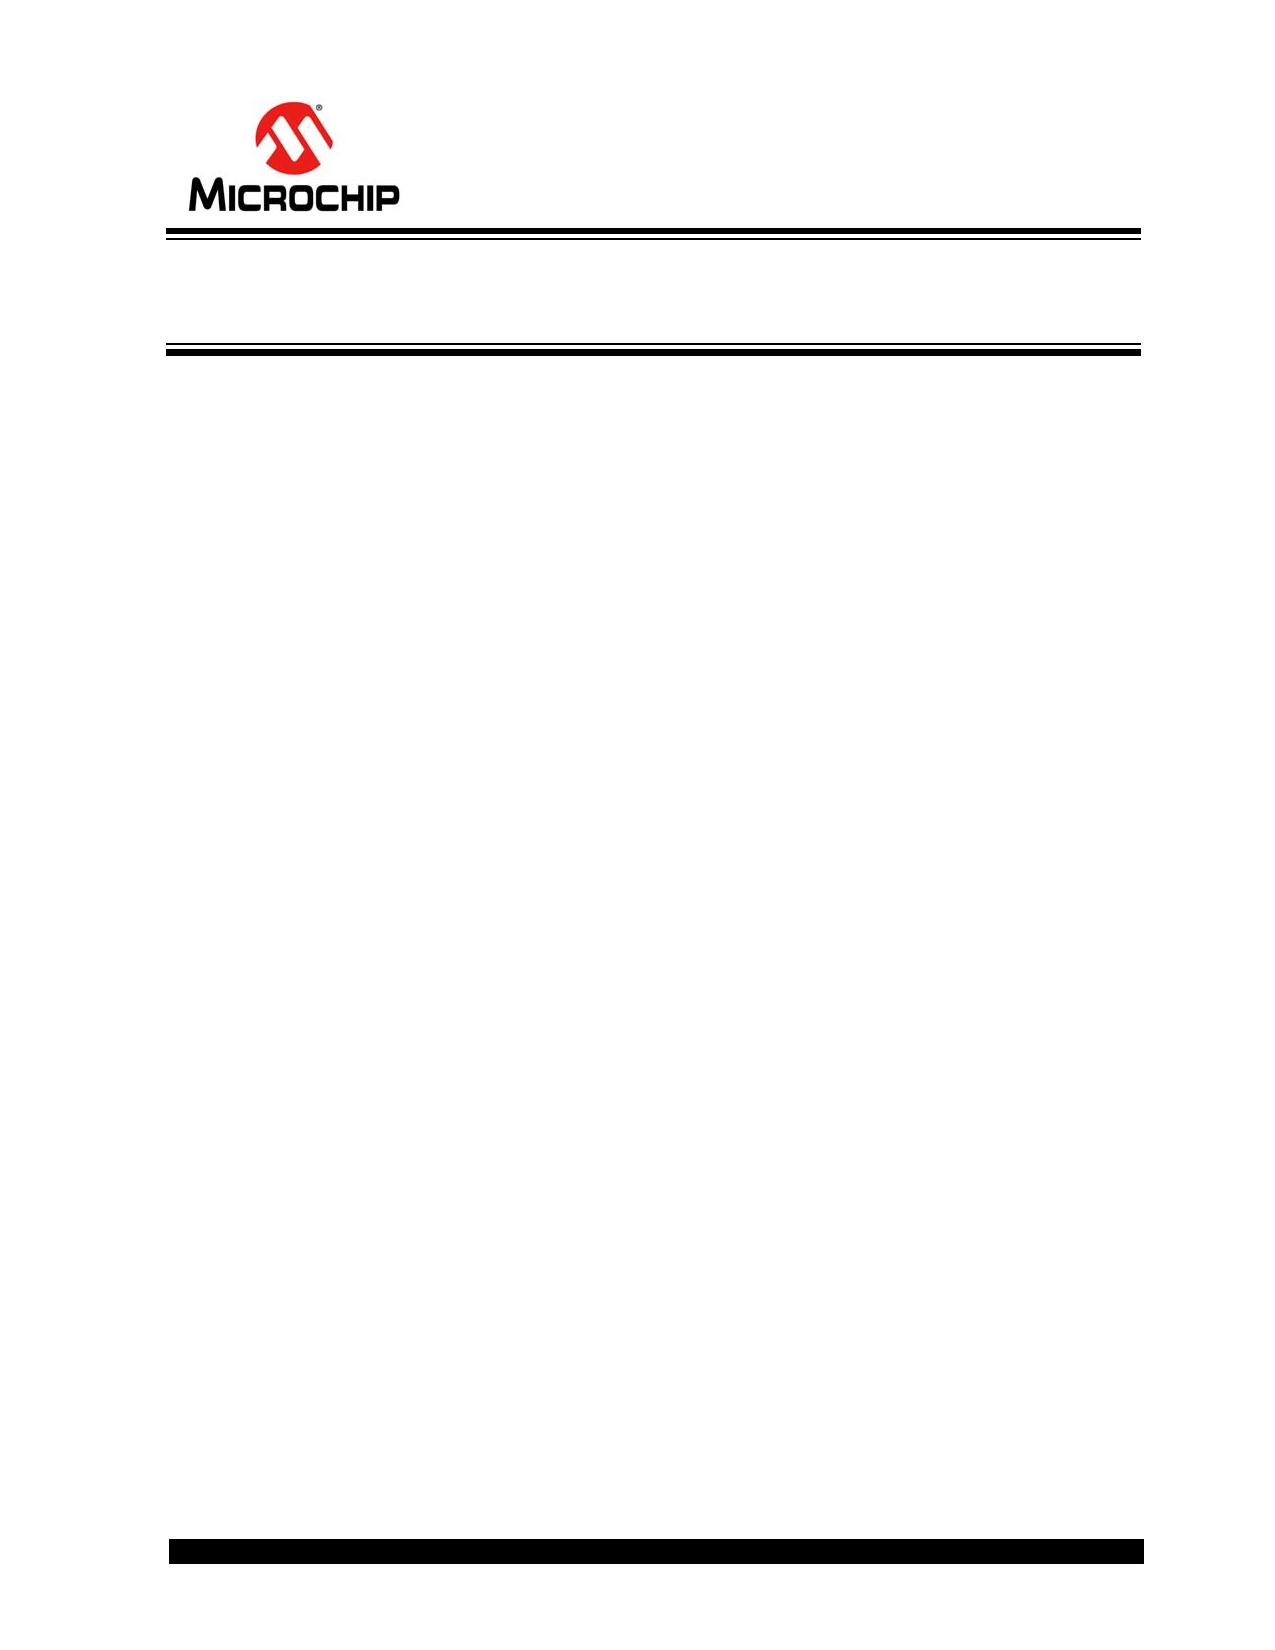 PIC24FV16KA301 데이터시트 및 PIC24FV16KA301 PDF